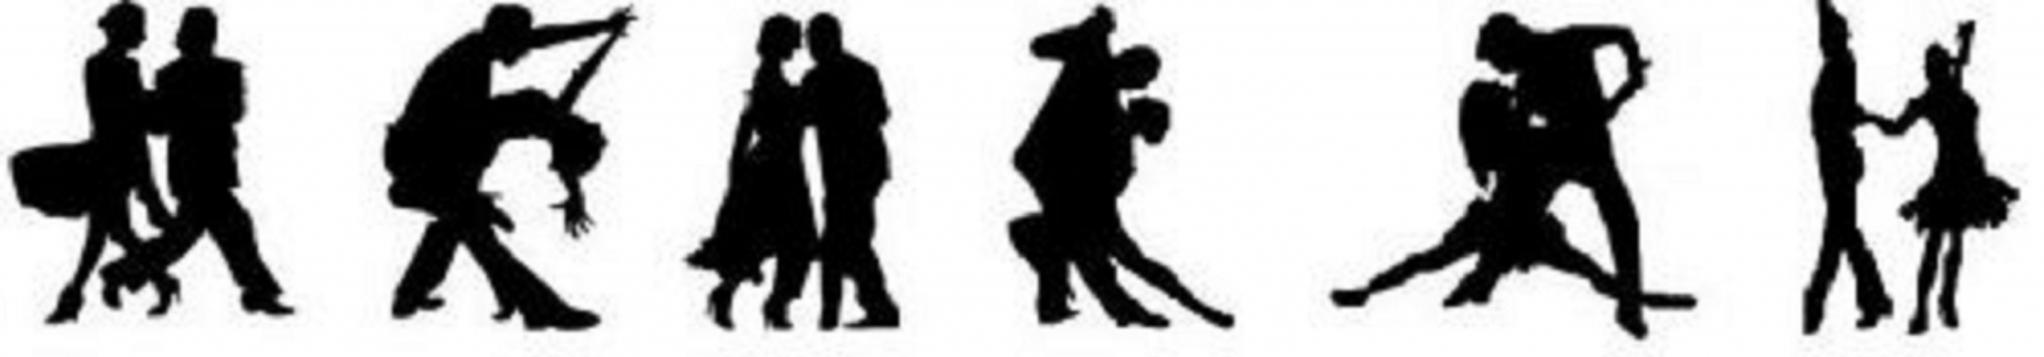 Comment choisir sa danse en couple : standard, latine, swing